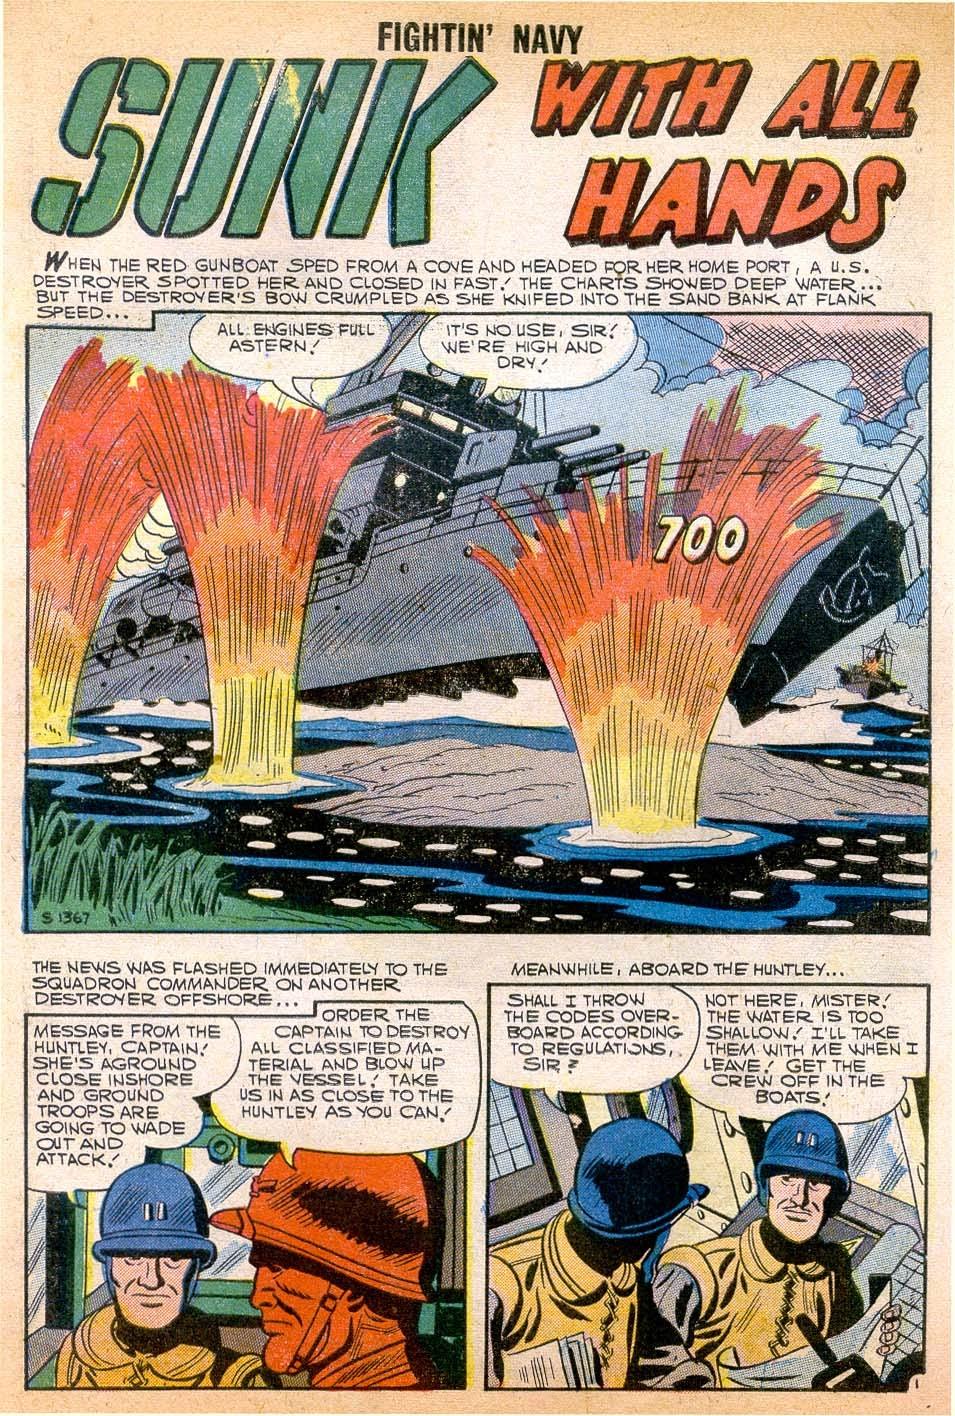 Read online Fightin' Navy comic -  Issue #79 - 27